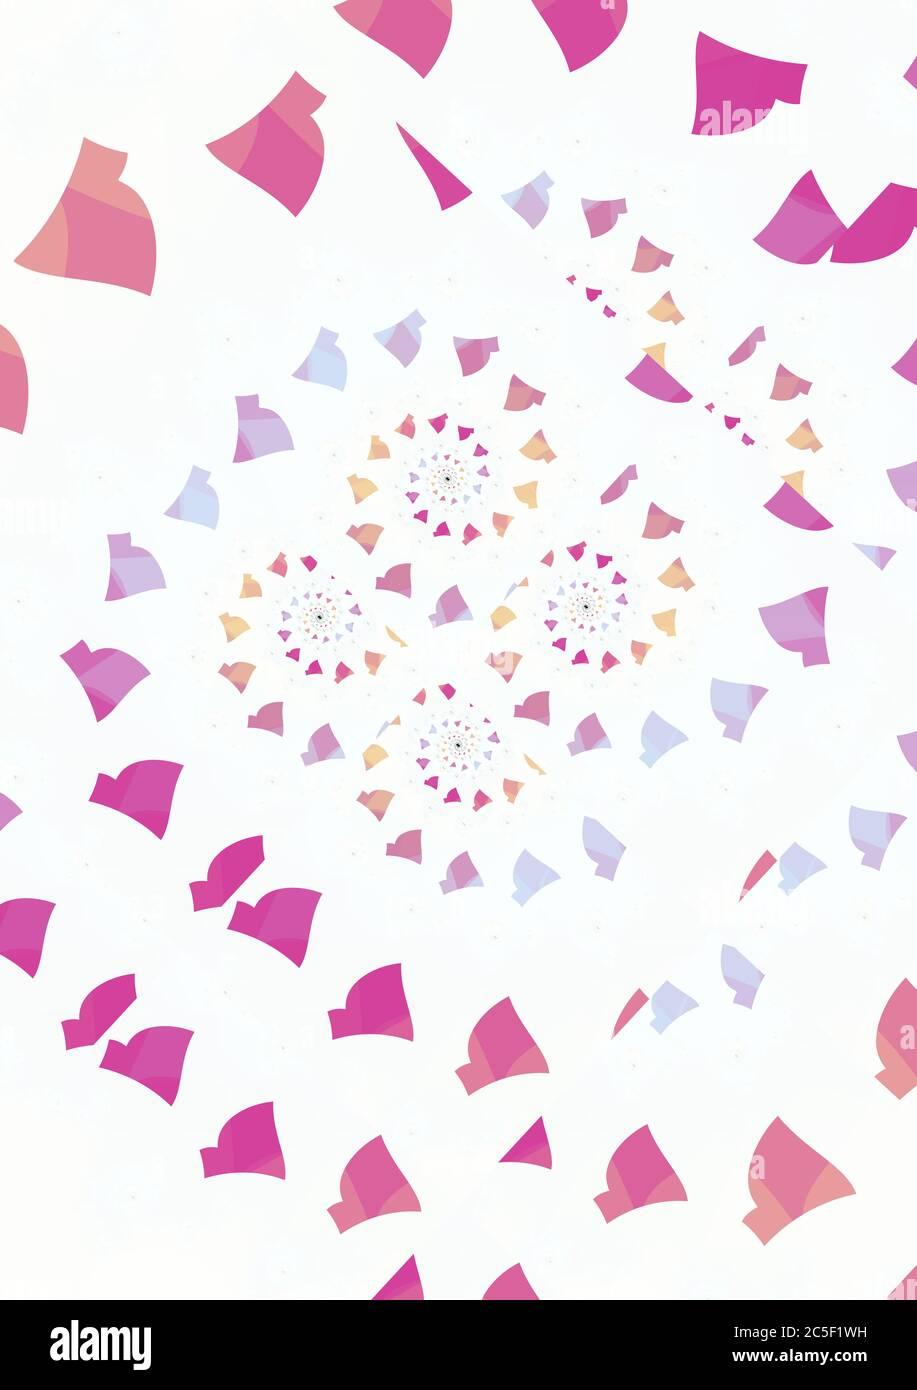 Spiralling Confetti Abstract Pattern Stock Photo